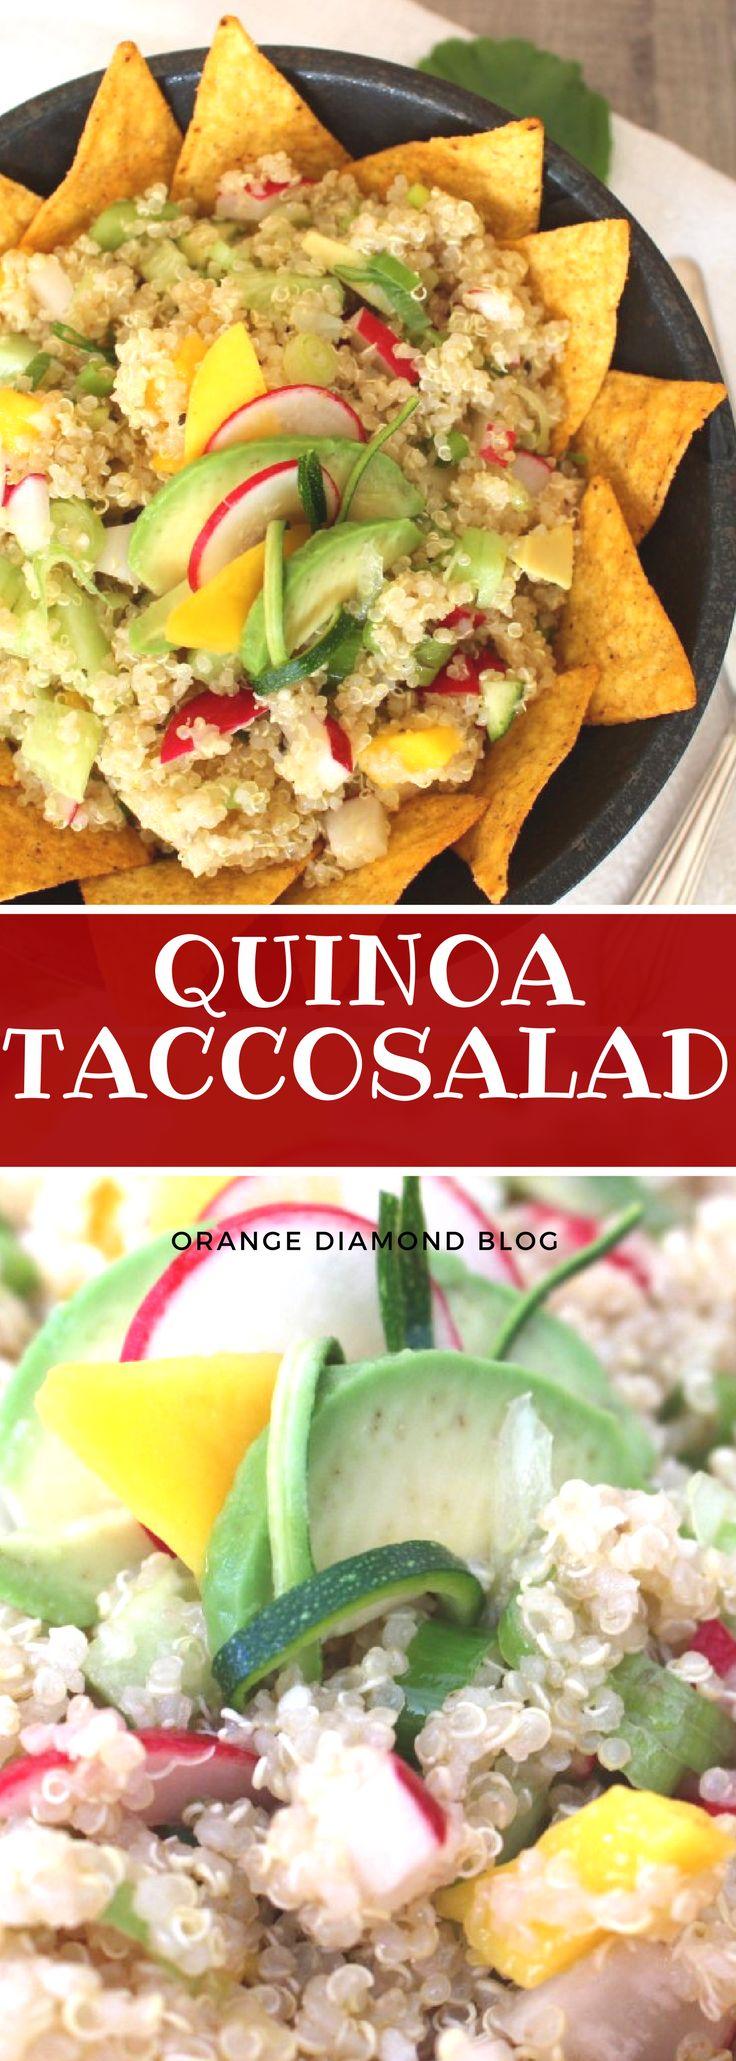 QUINOA - TACCOSALAT mit AVOCADO und MANGO! Sommerlicher Low-Carb Fitness-Salat.